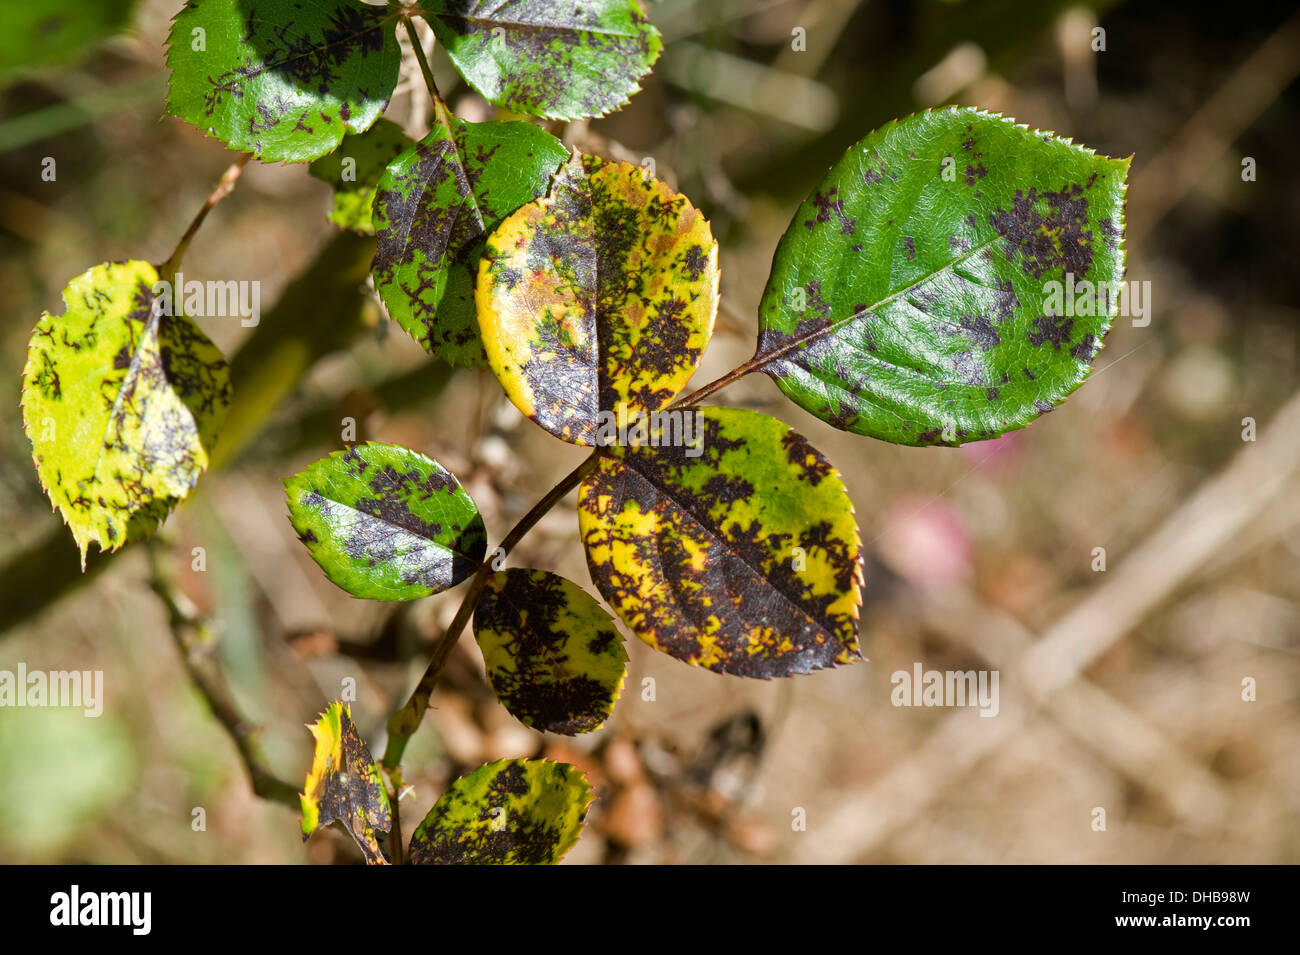 Rose spot, Diplocarpon rosae, a fungal disease on rose leaves in summer - Stock Image